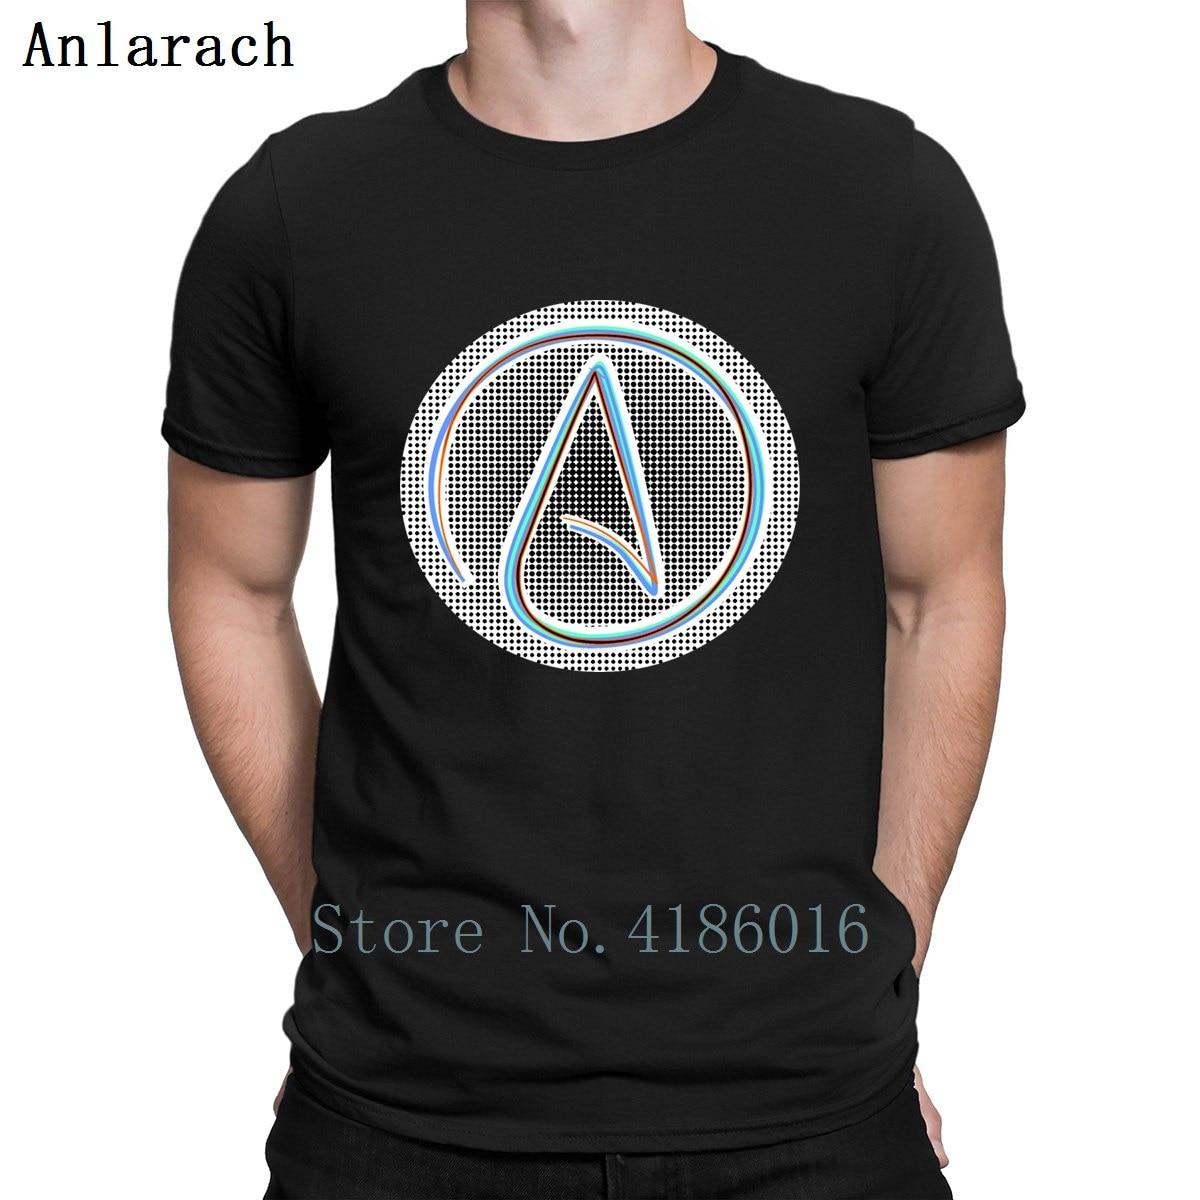 Atheist Atheism God Jesus Believe Cool Circle camiseta Normal s-xxxl Crazy Designer primavera algodón nueva moda ropa camisa